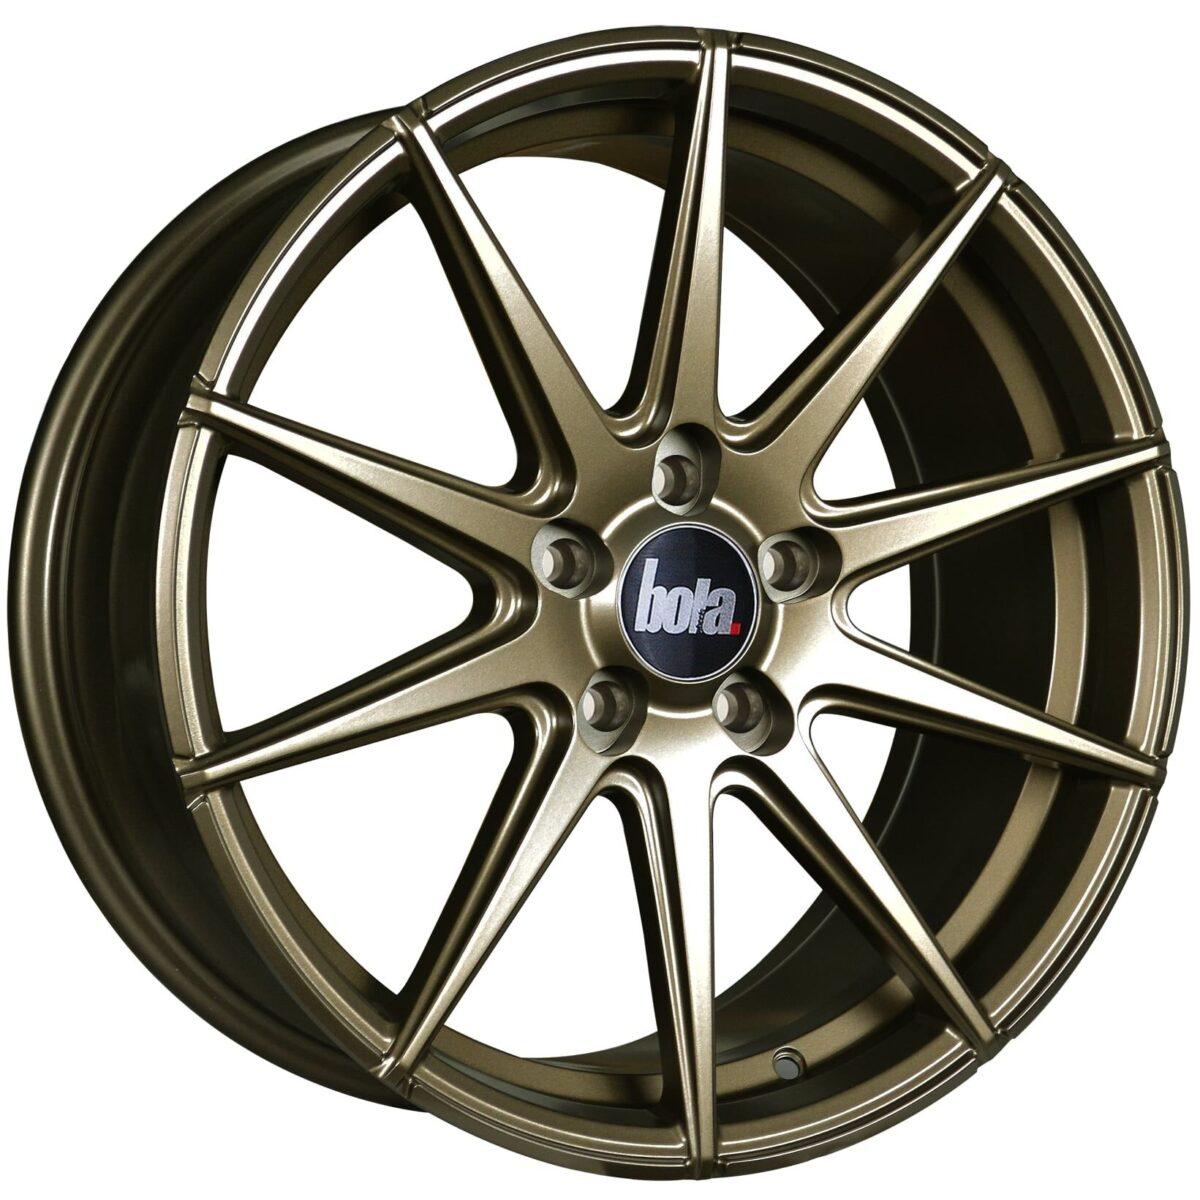 "19"" BOLA CSR Wheels - Matt Bronze - VW / Audi / Mercedes - 5x112"